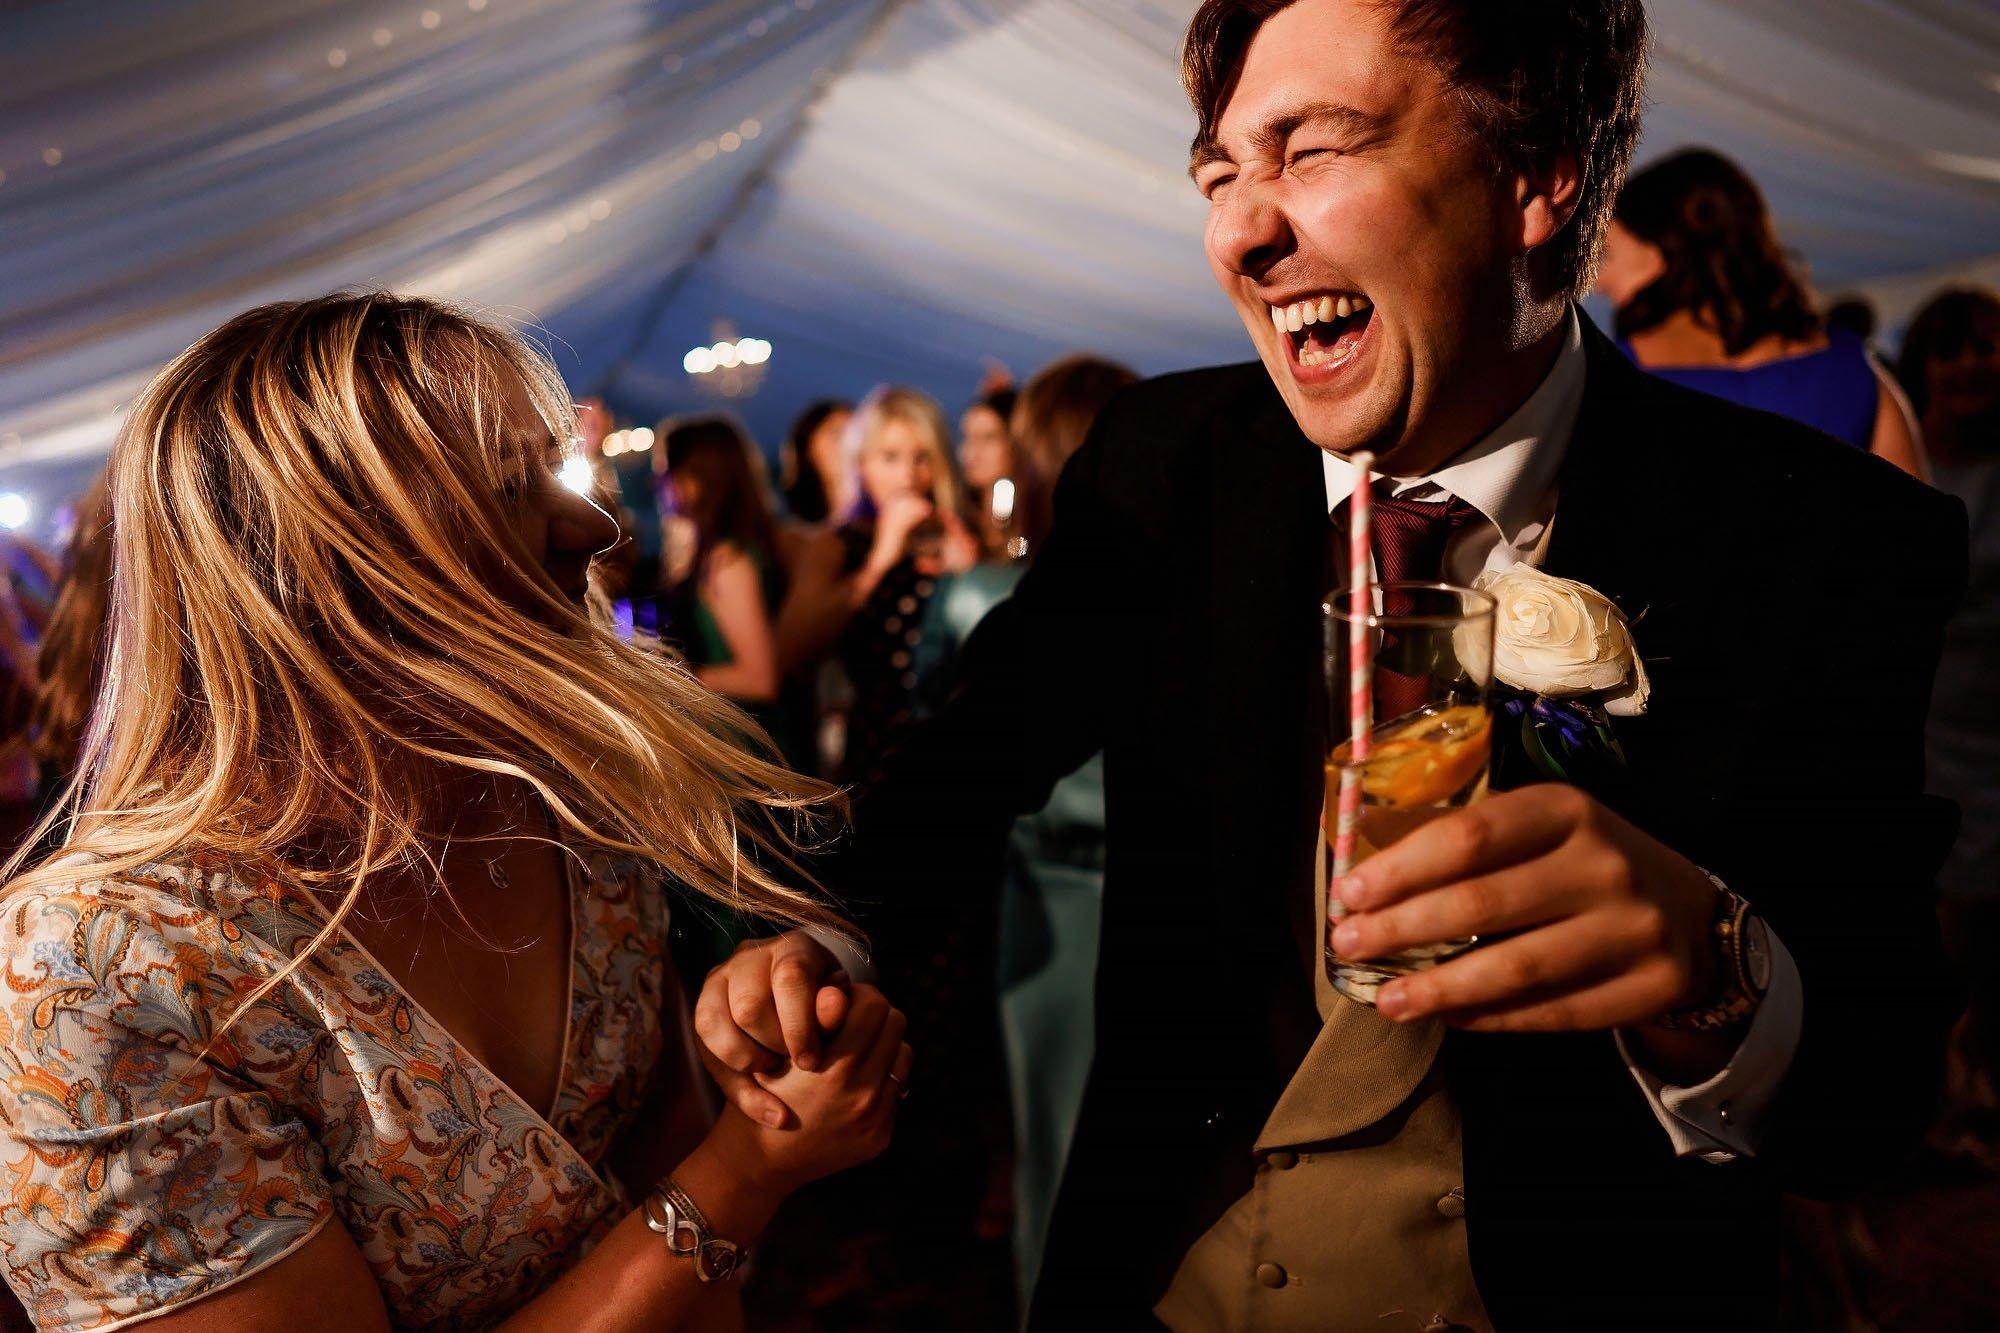 Shropshire Marquee Wedding - ARJ Photography®